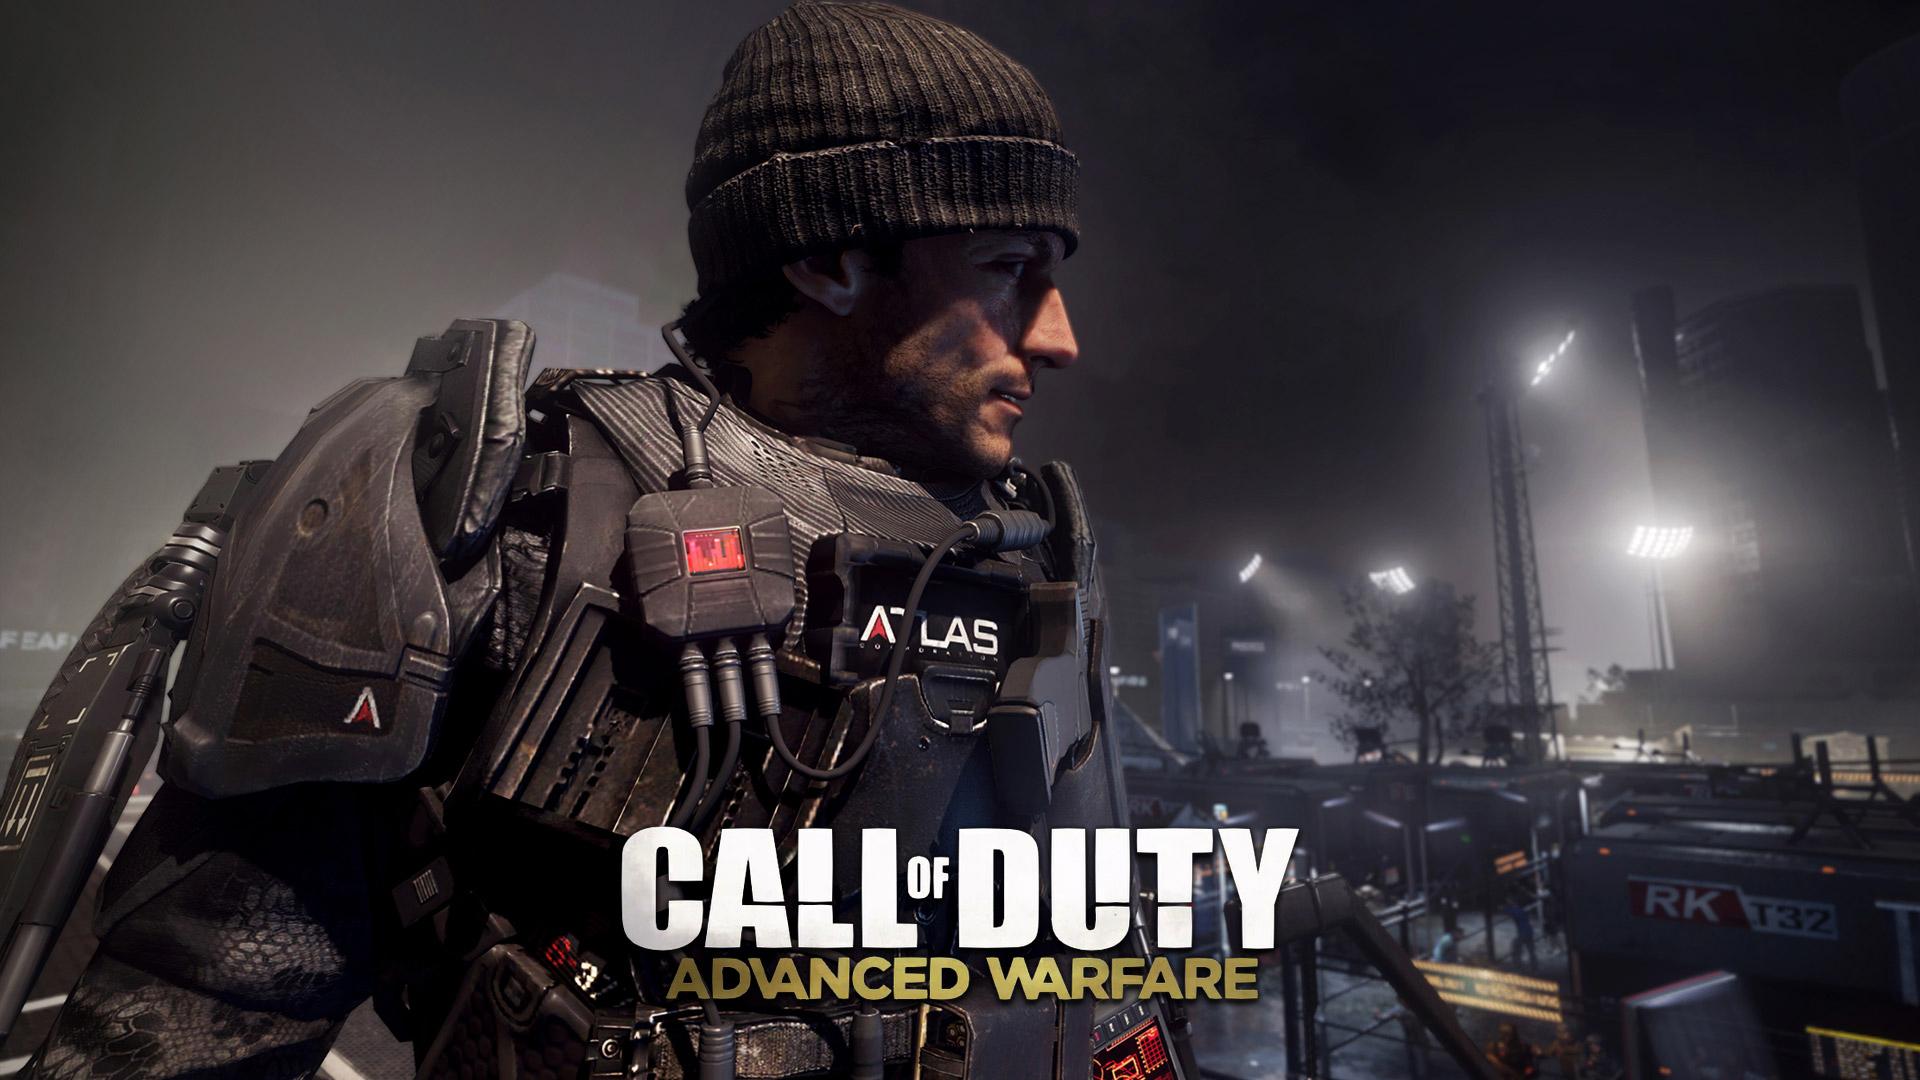 call-of-duty-advanced-warfare-game-hd-1920x1080